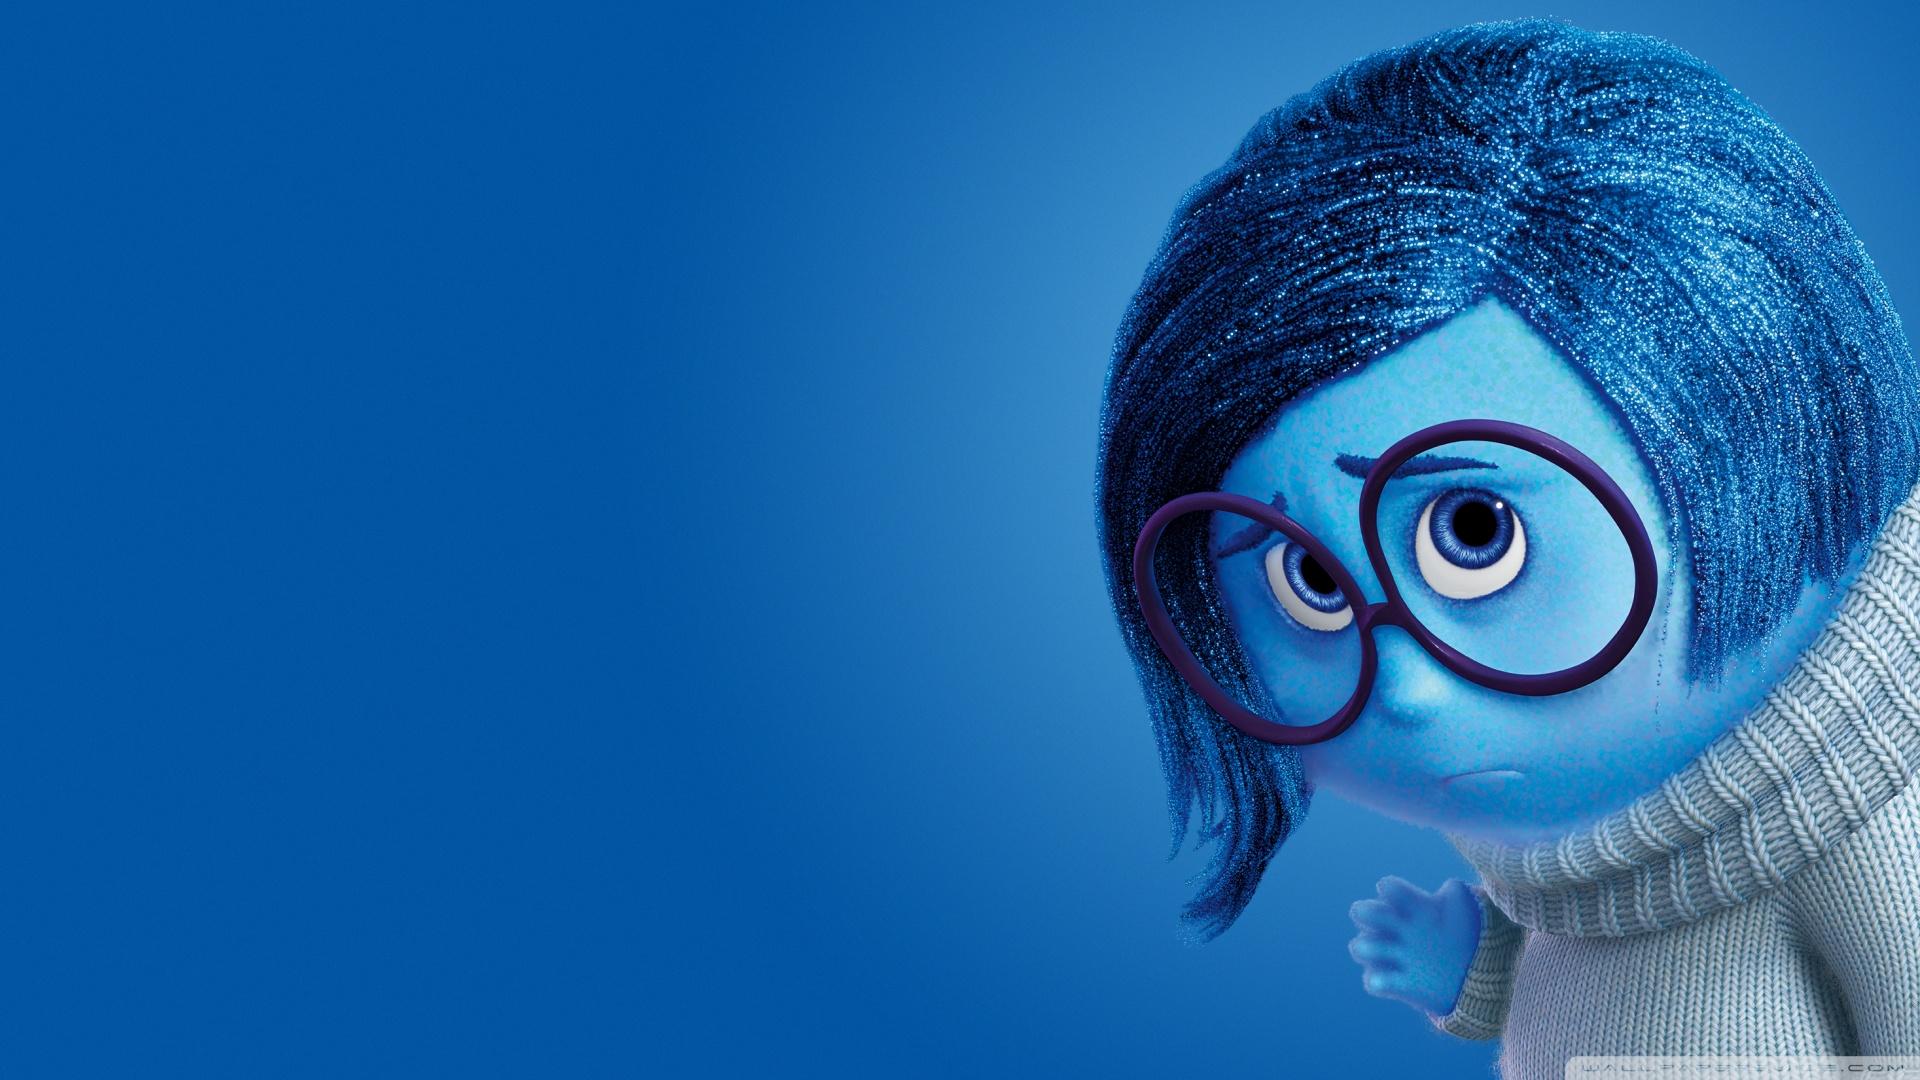 Inside Out Sadness   Disney Pixar 4K HD Desktop Wallpaper for 1920x1080